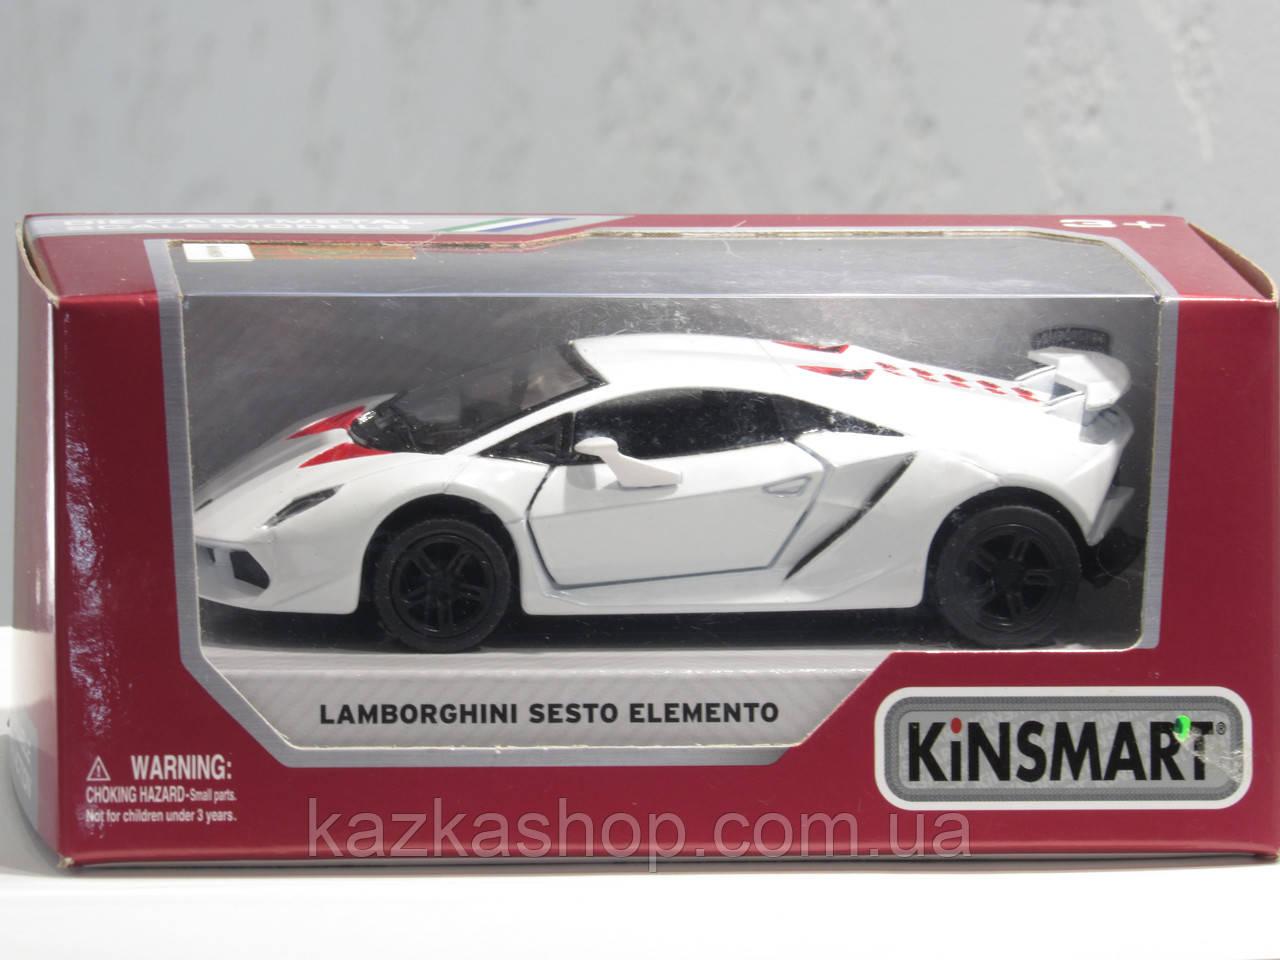 Металлическая машинка Kinsmart LAMBORGHINI SESTO ELEMENTO (KT 5359 WP)